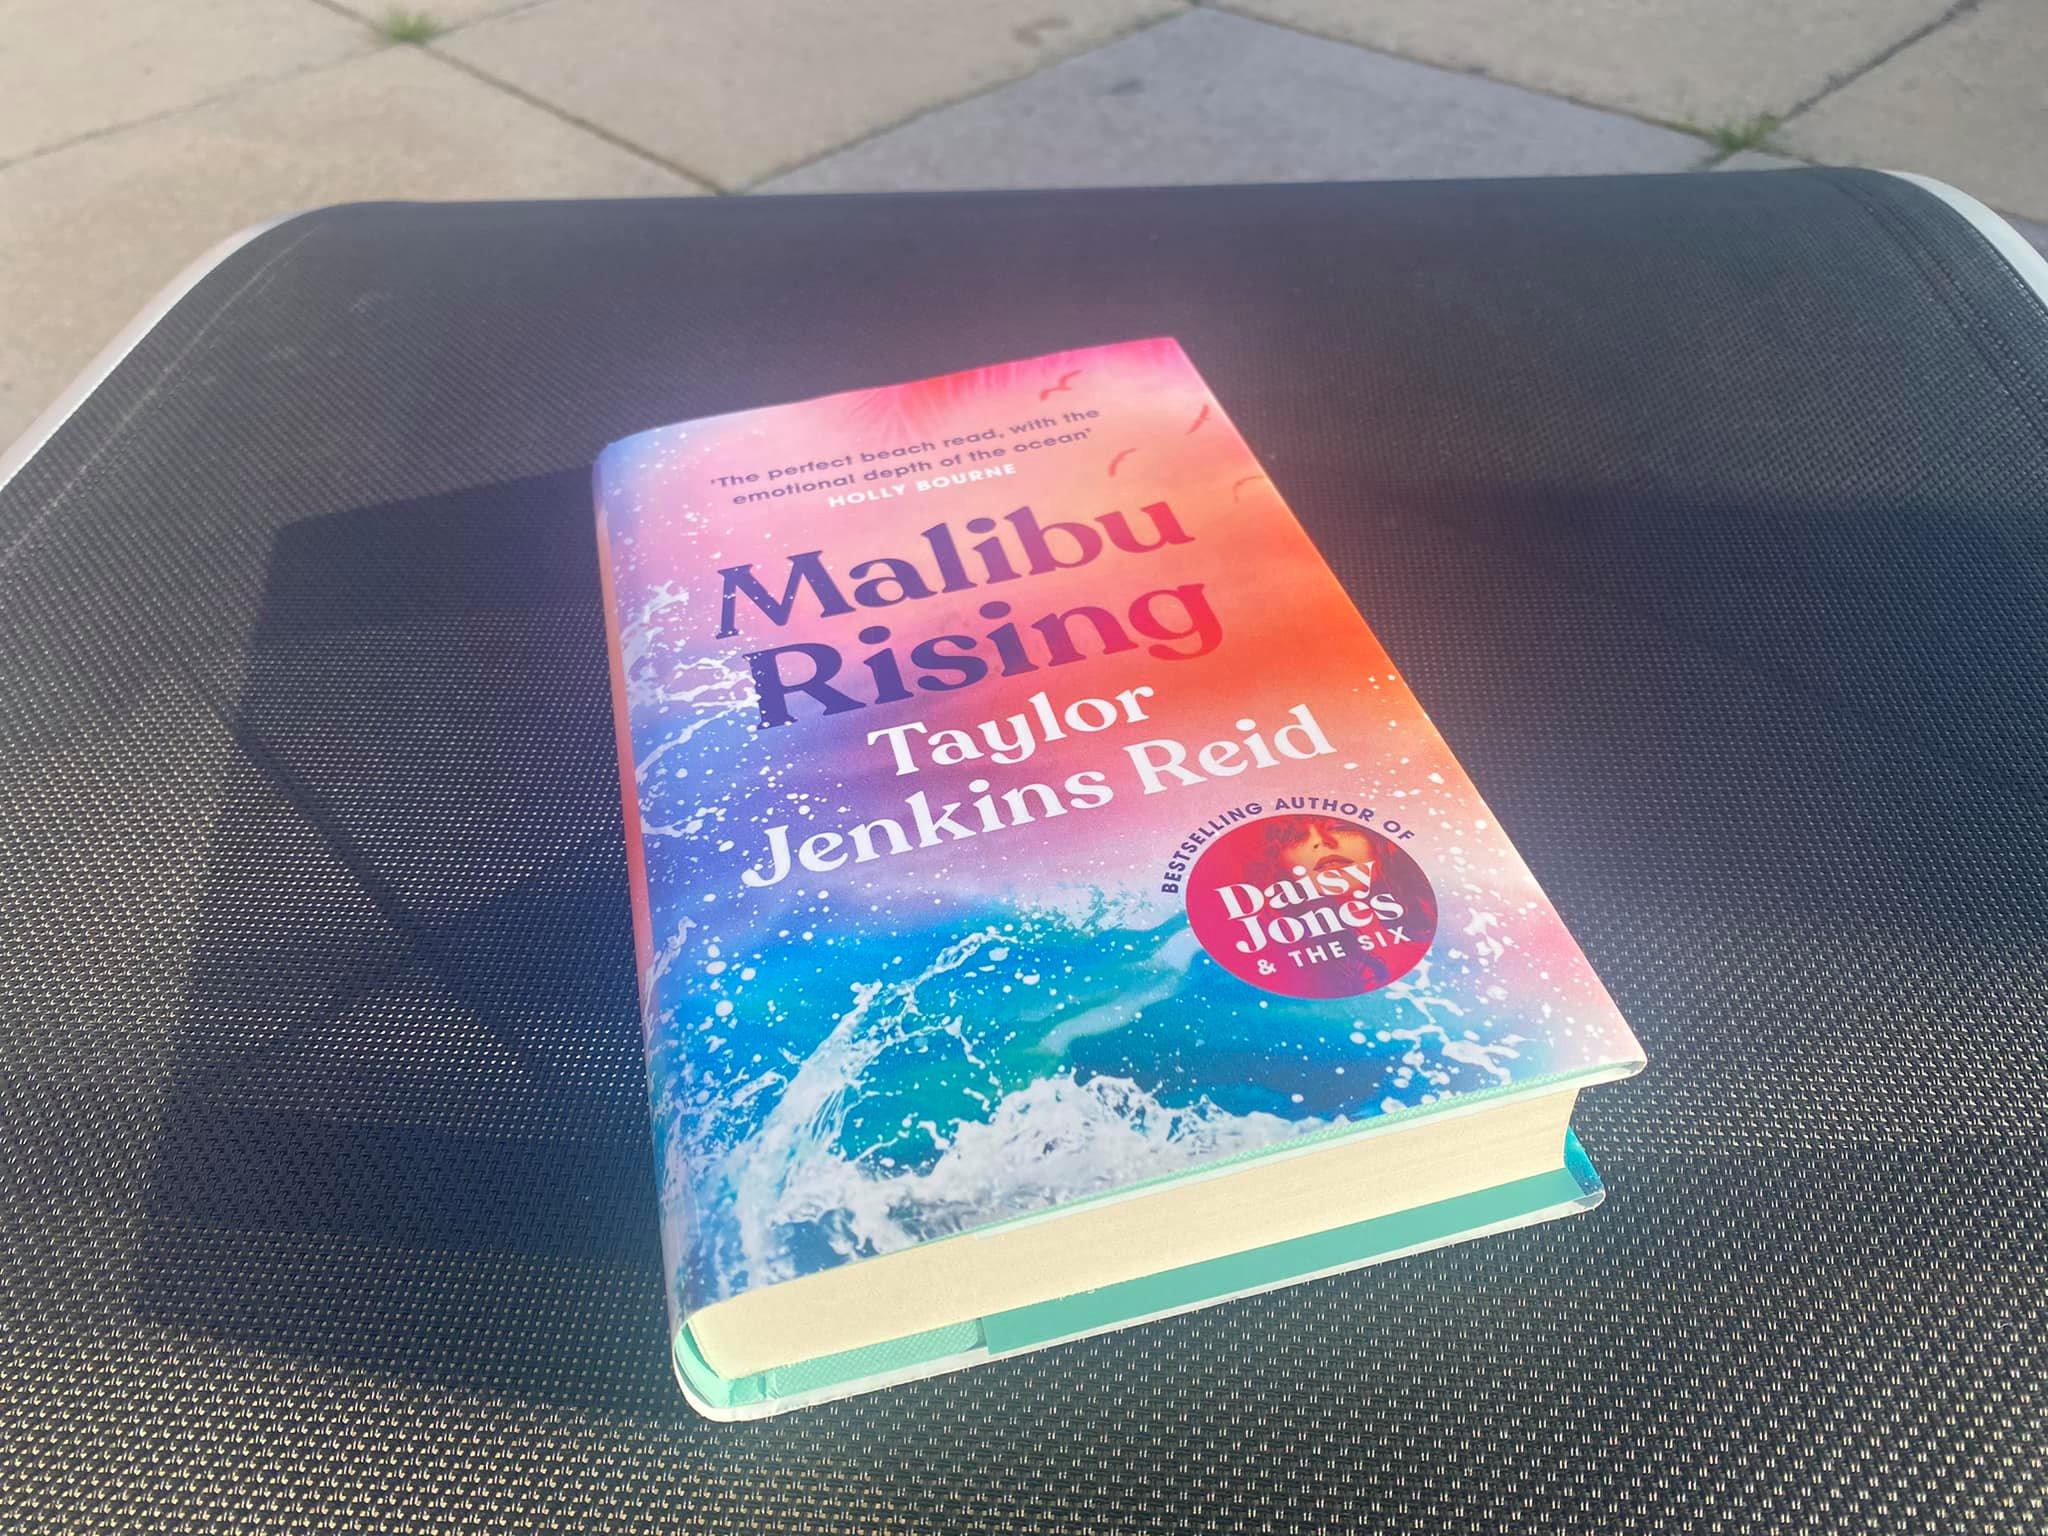 Malibu Rising gift from Jet 2